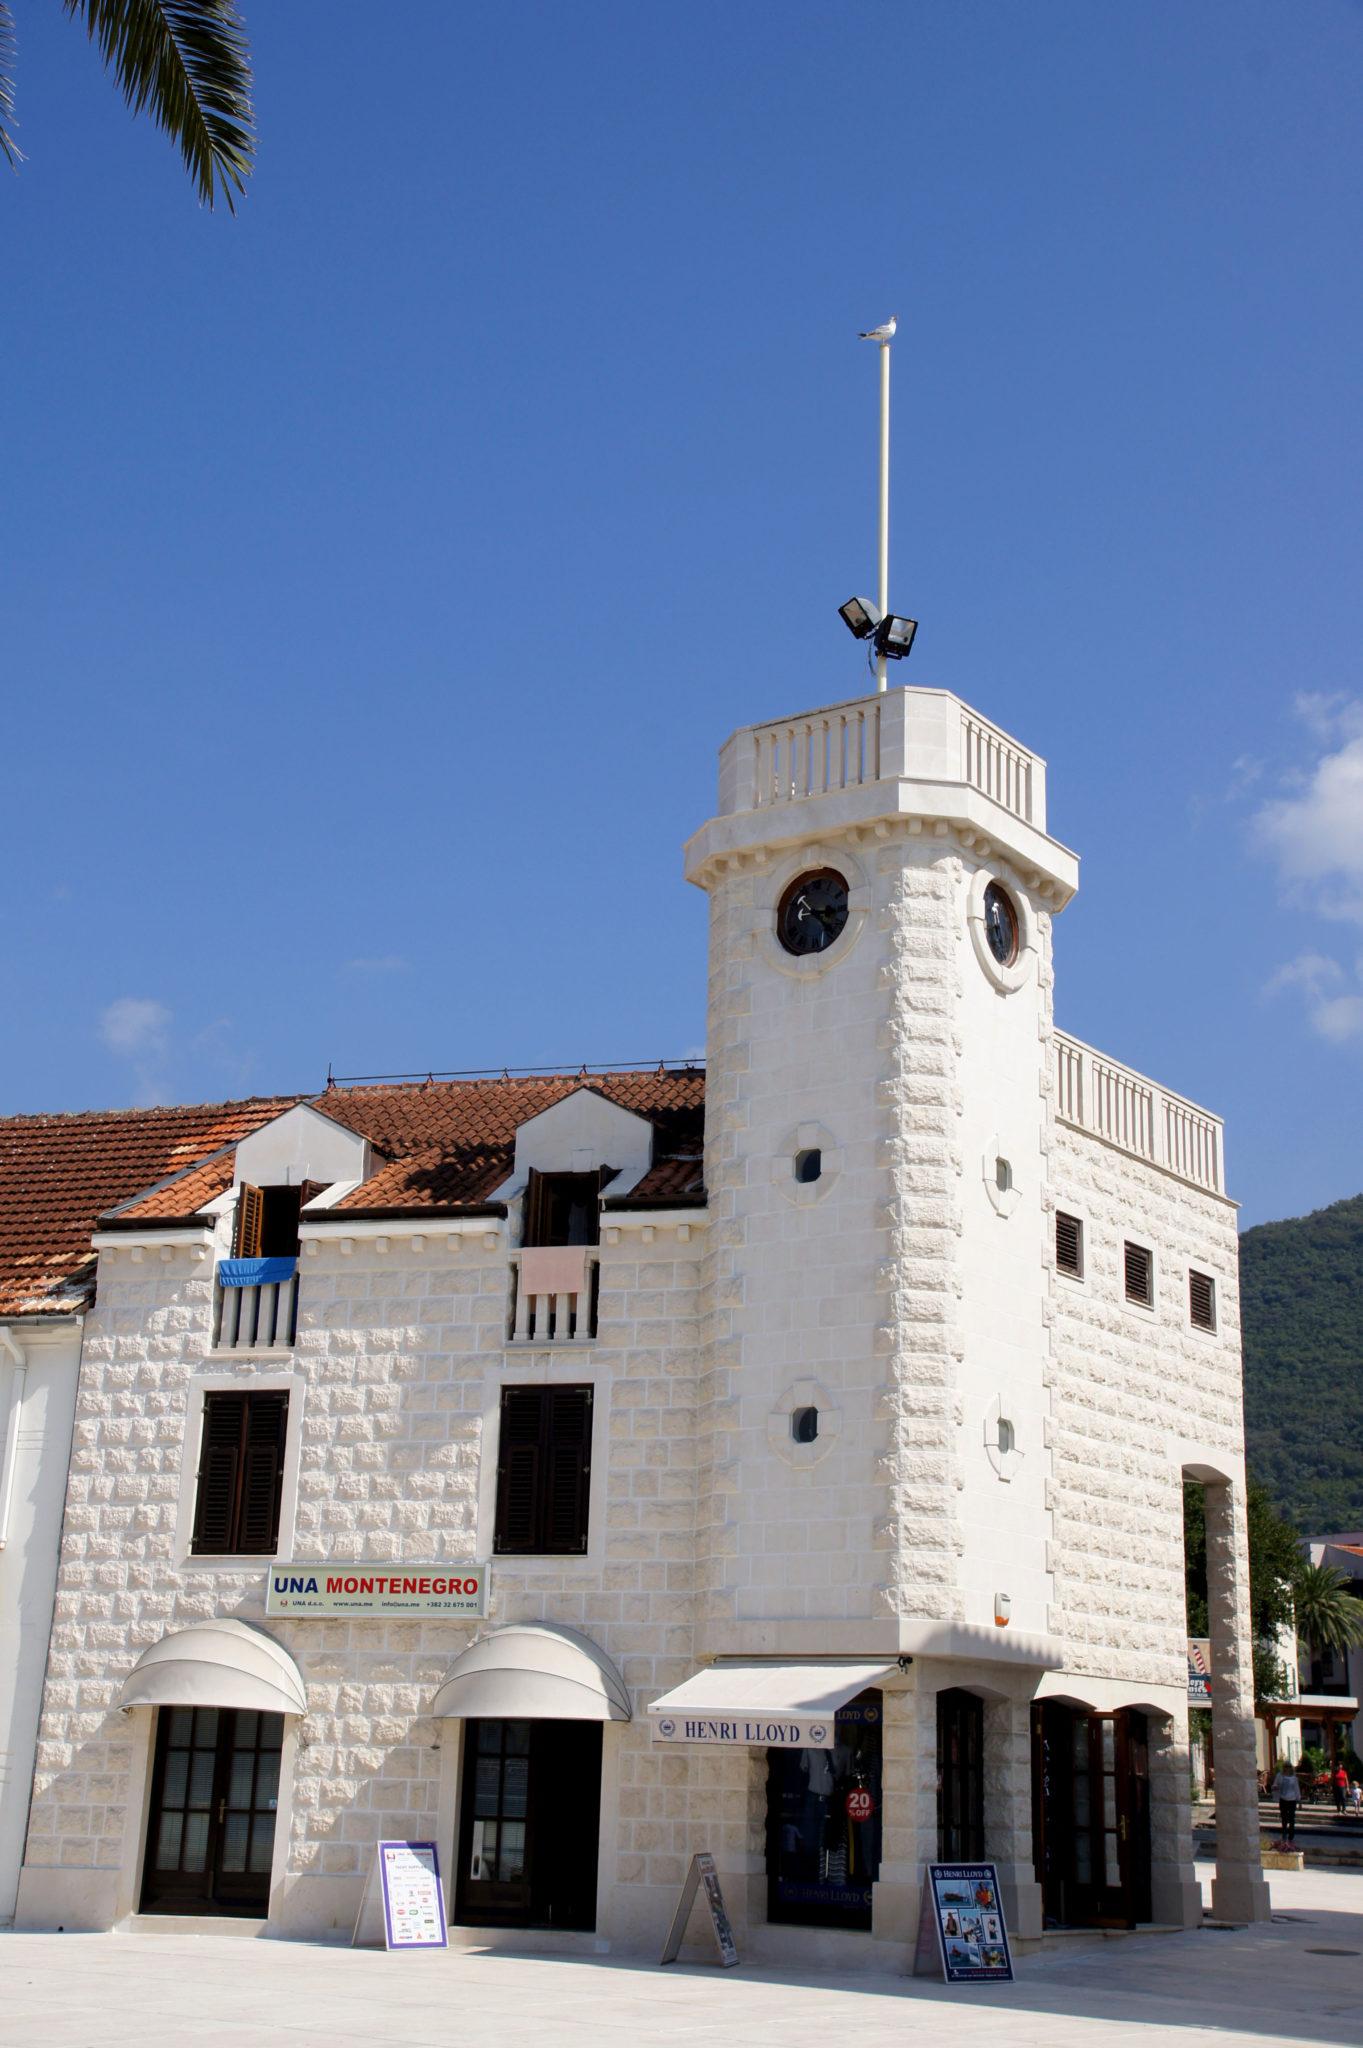 Hema_Porto_Montenegro_Blog_Voyage_Travel